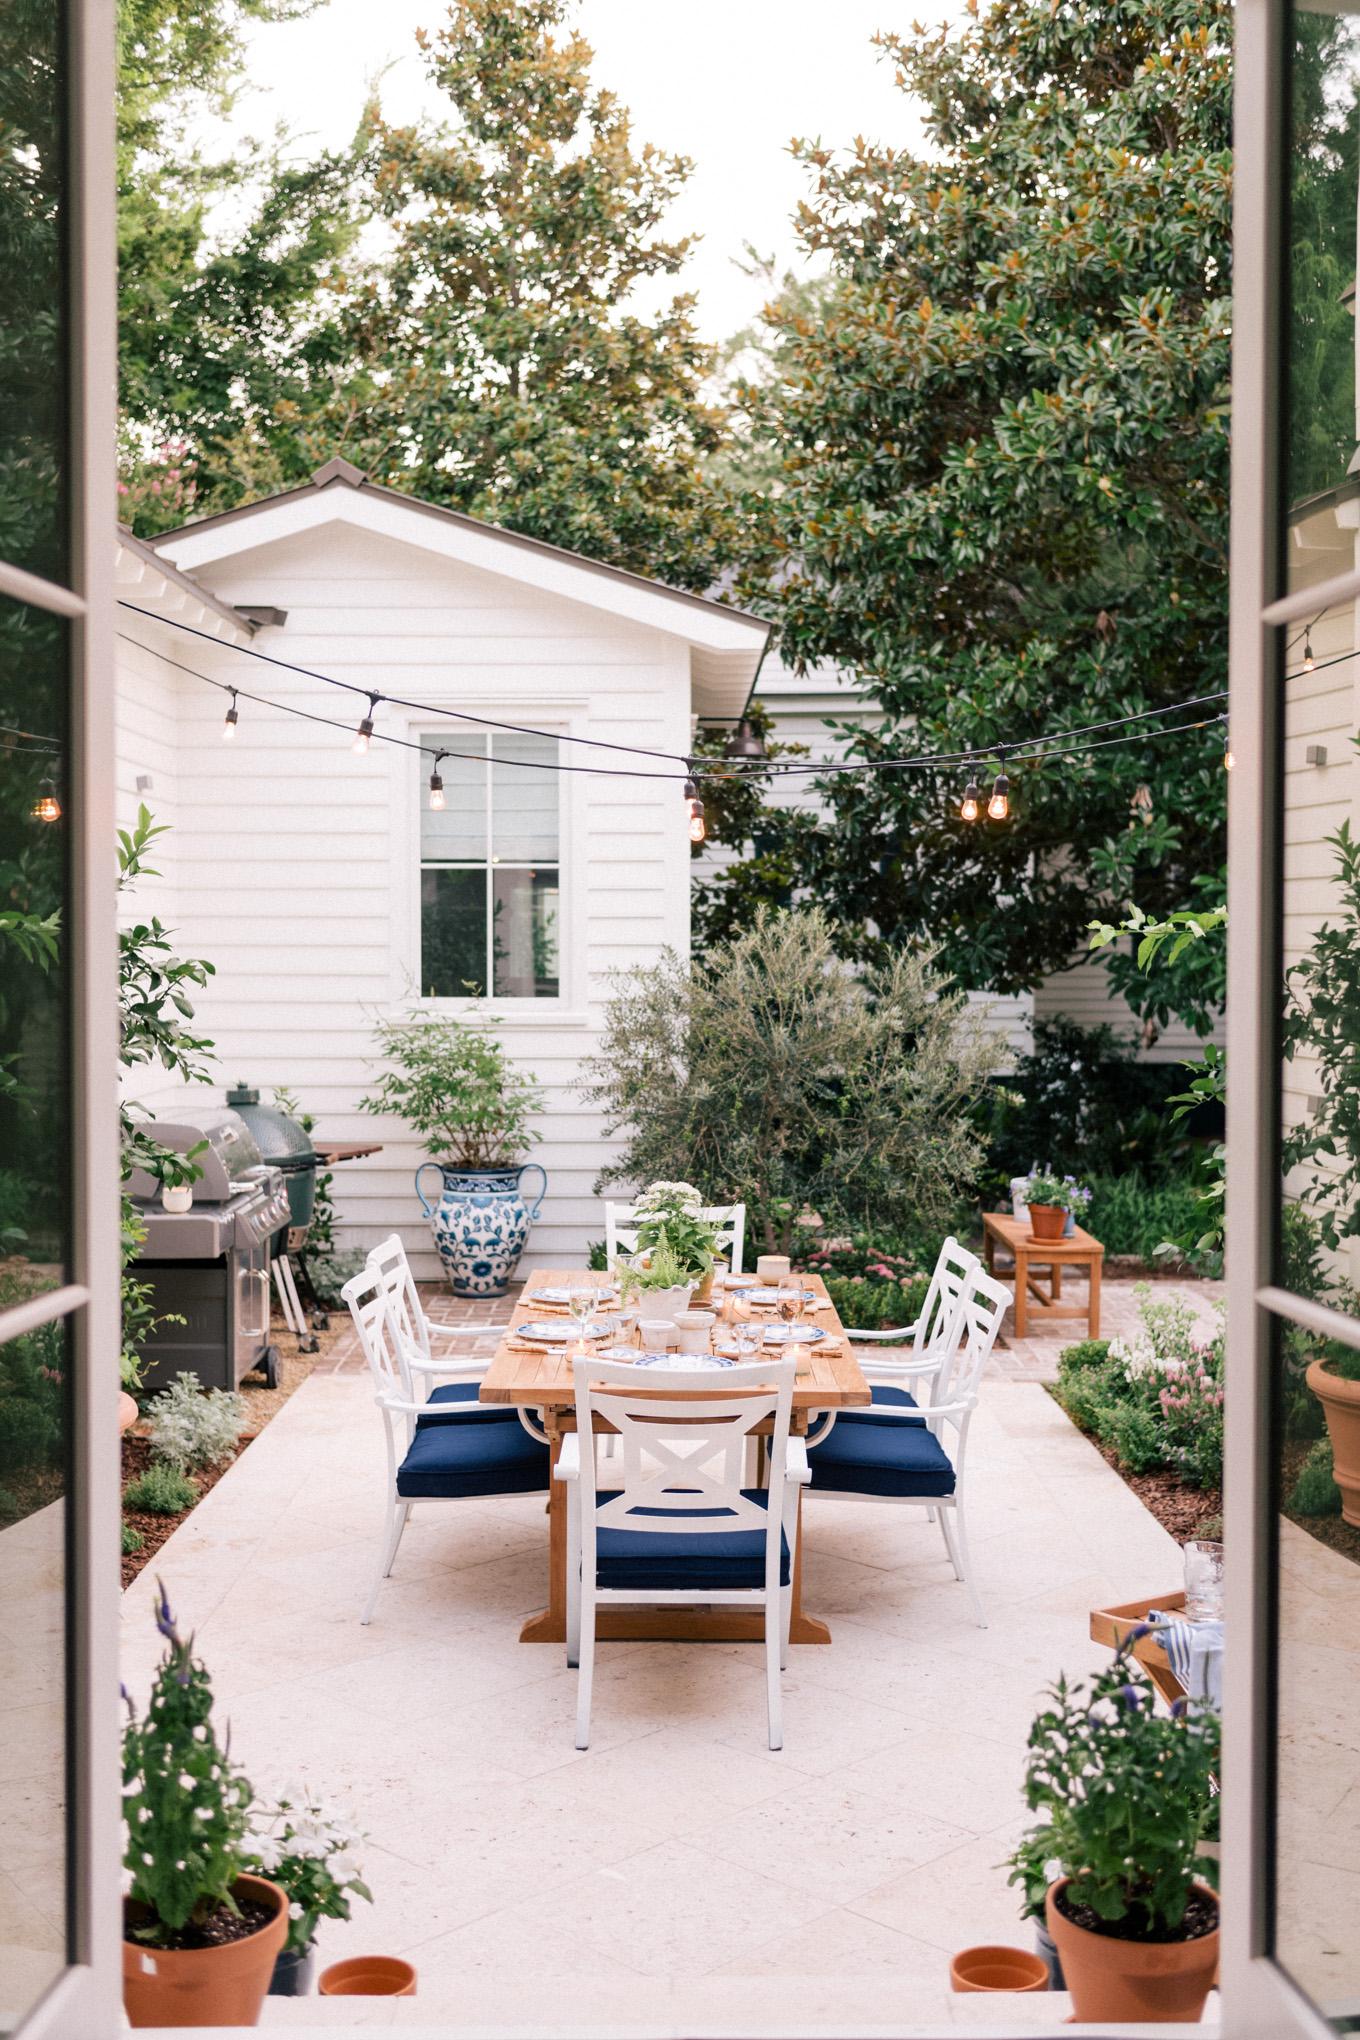 gmg-entertaining-backyard-courtyard-makeover-lowes-caitlin-elizabeth-james-rhode-island-ranch.jpg